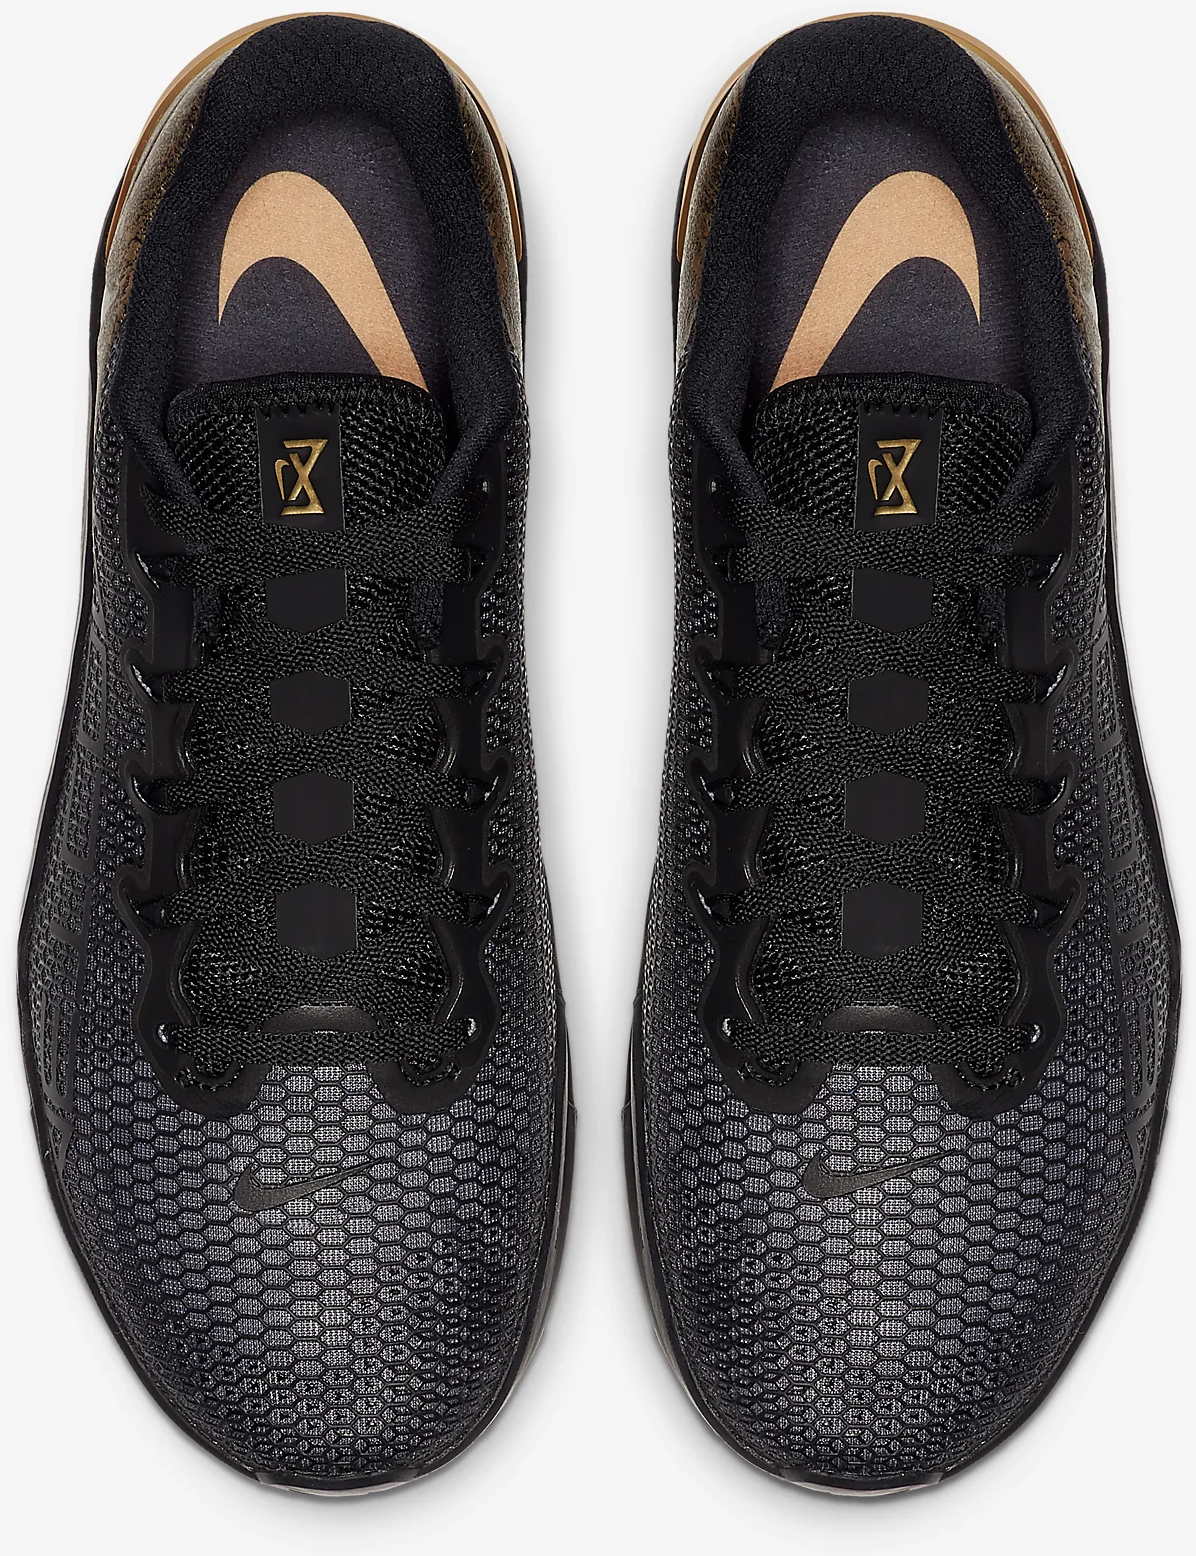 New Nike Metcon CrossFit Training Shoe